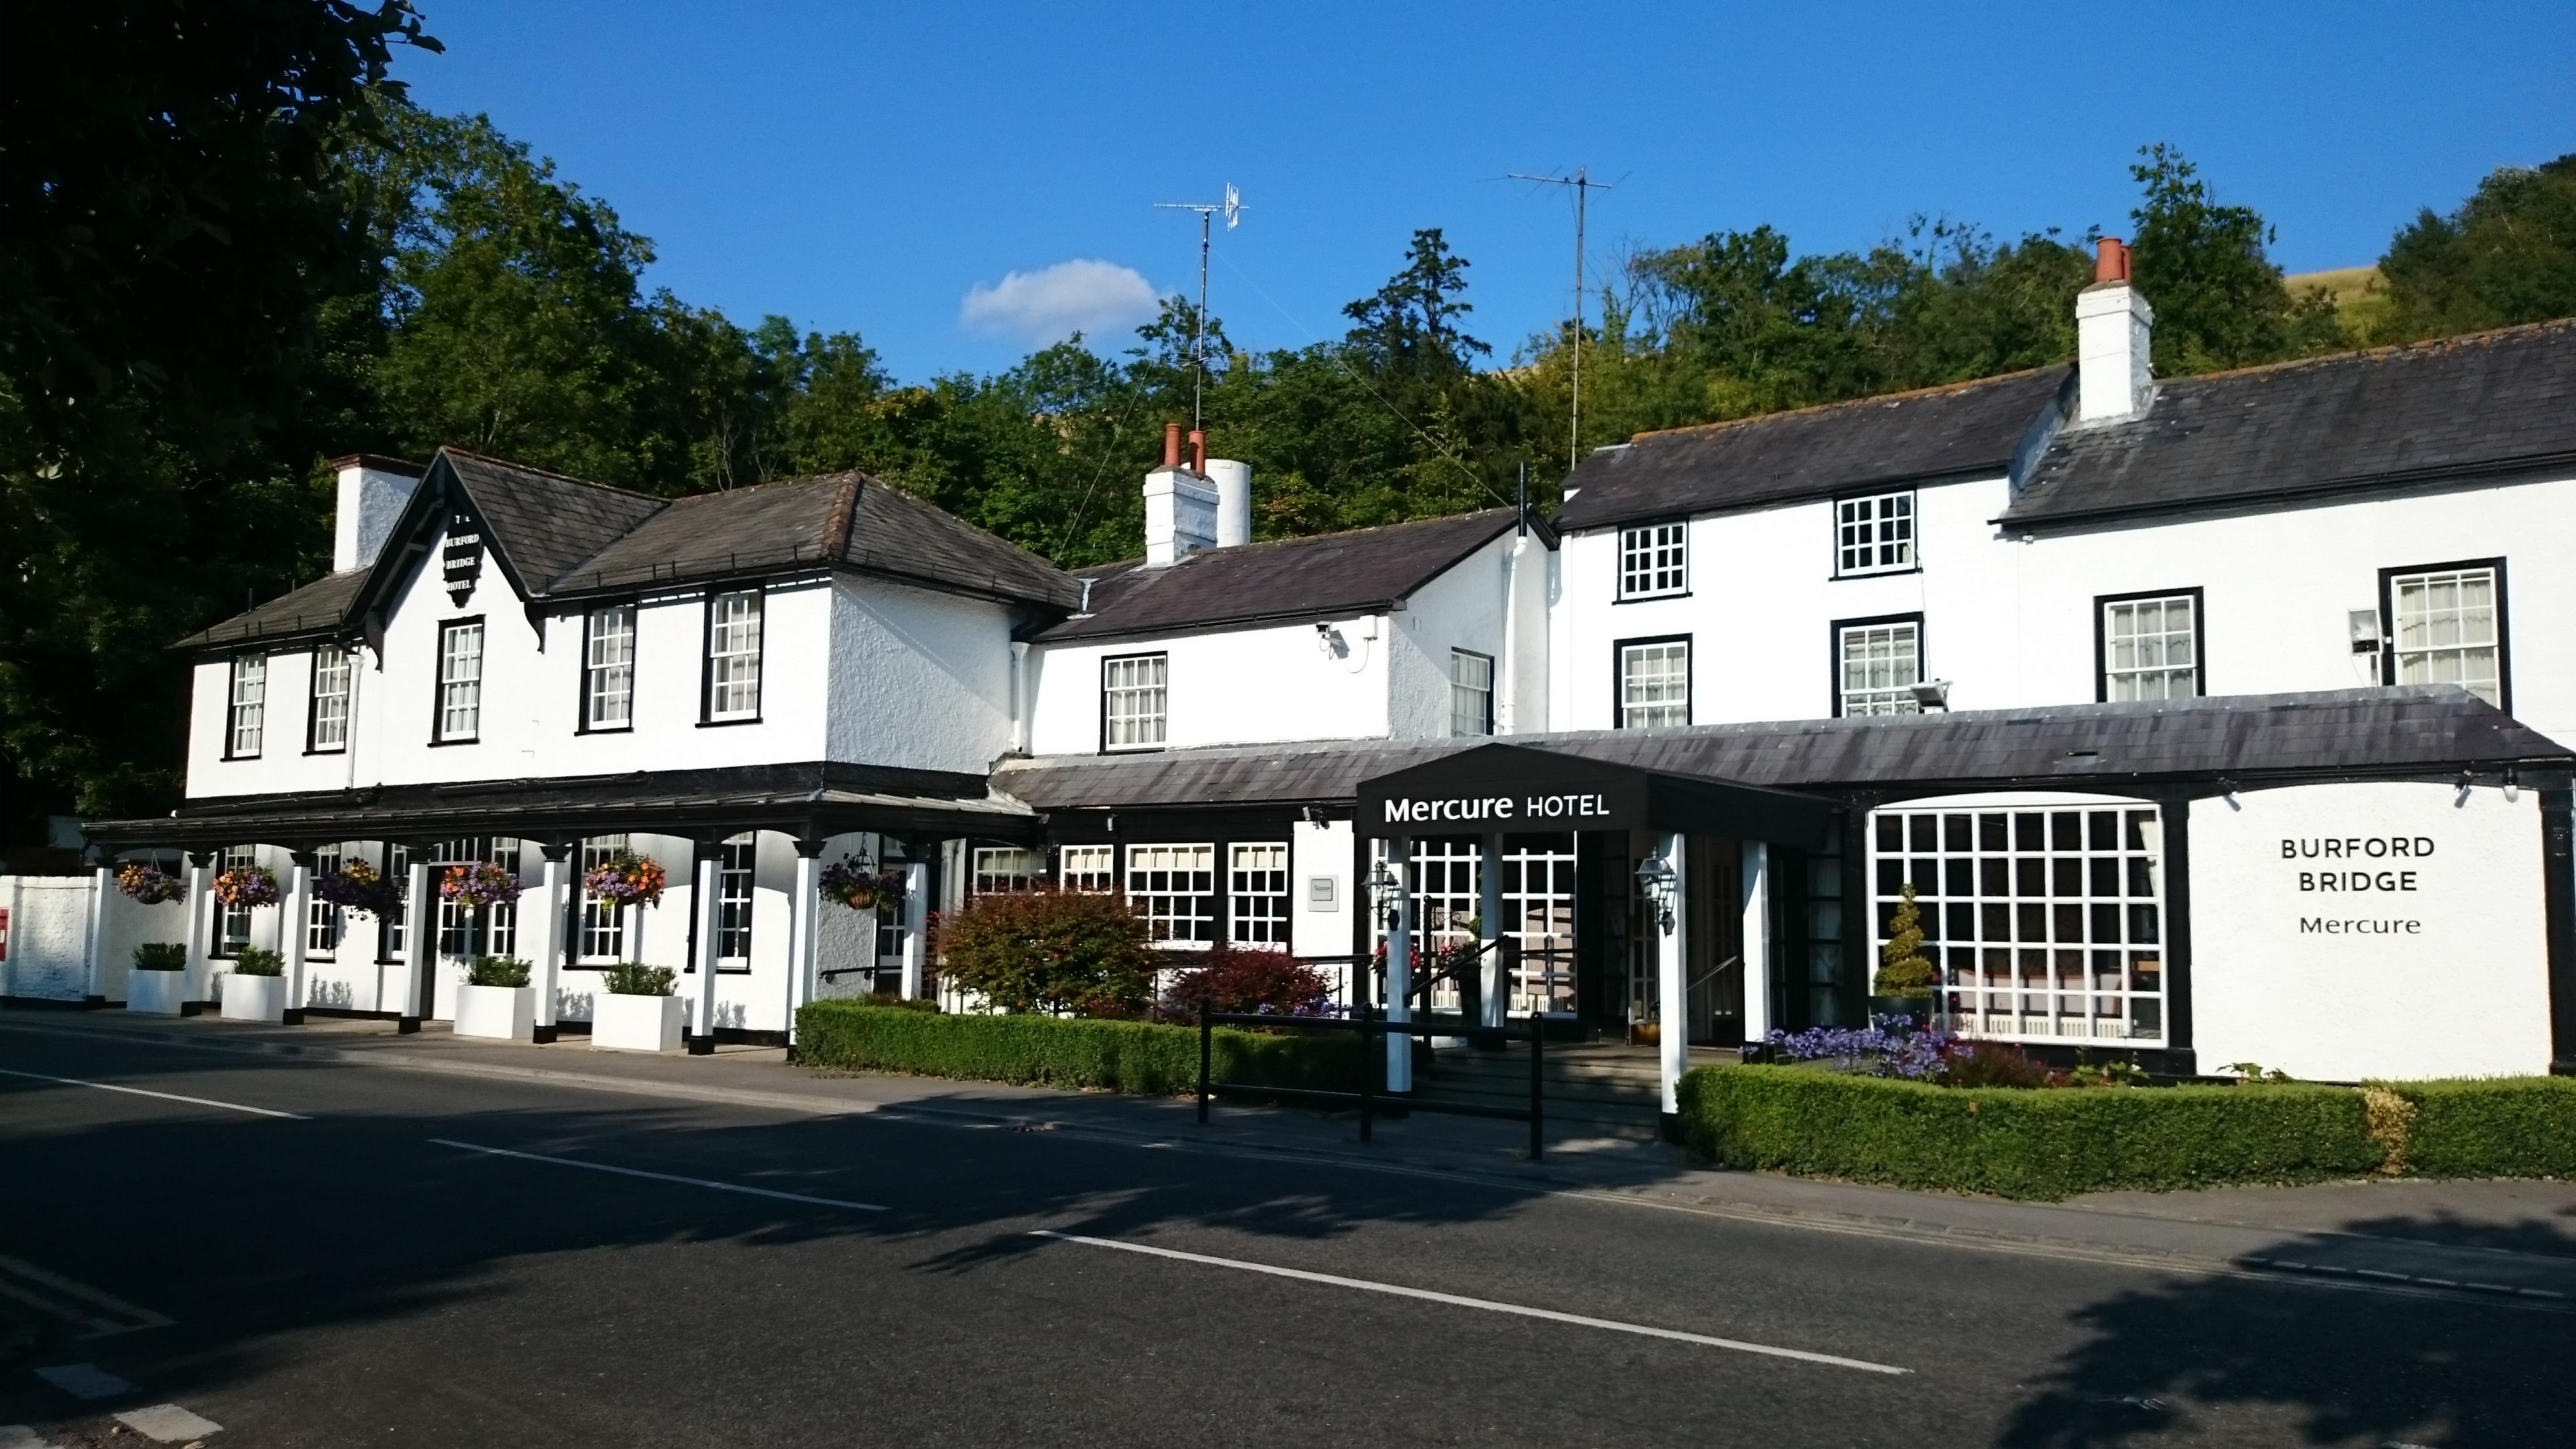 Burford Bridge Hotel Restaurant